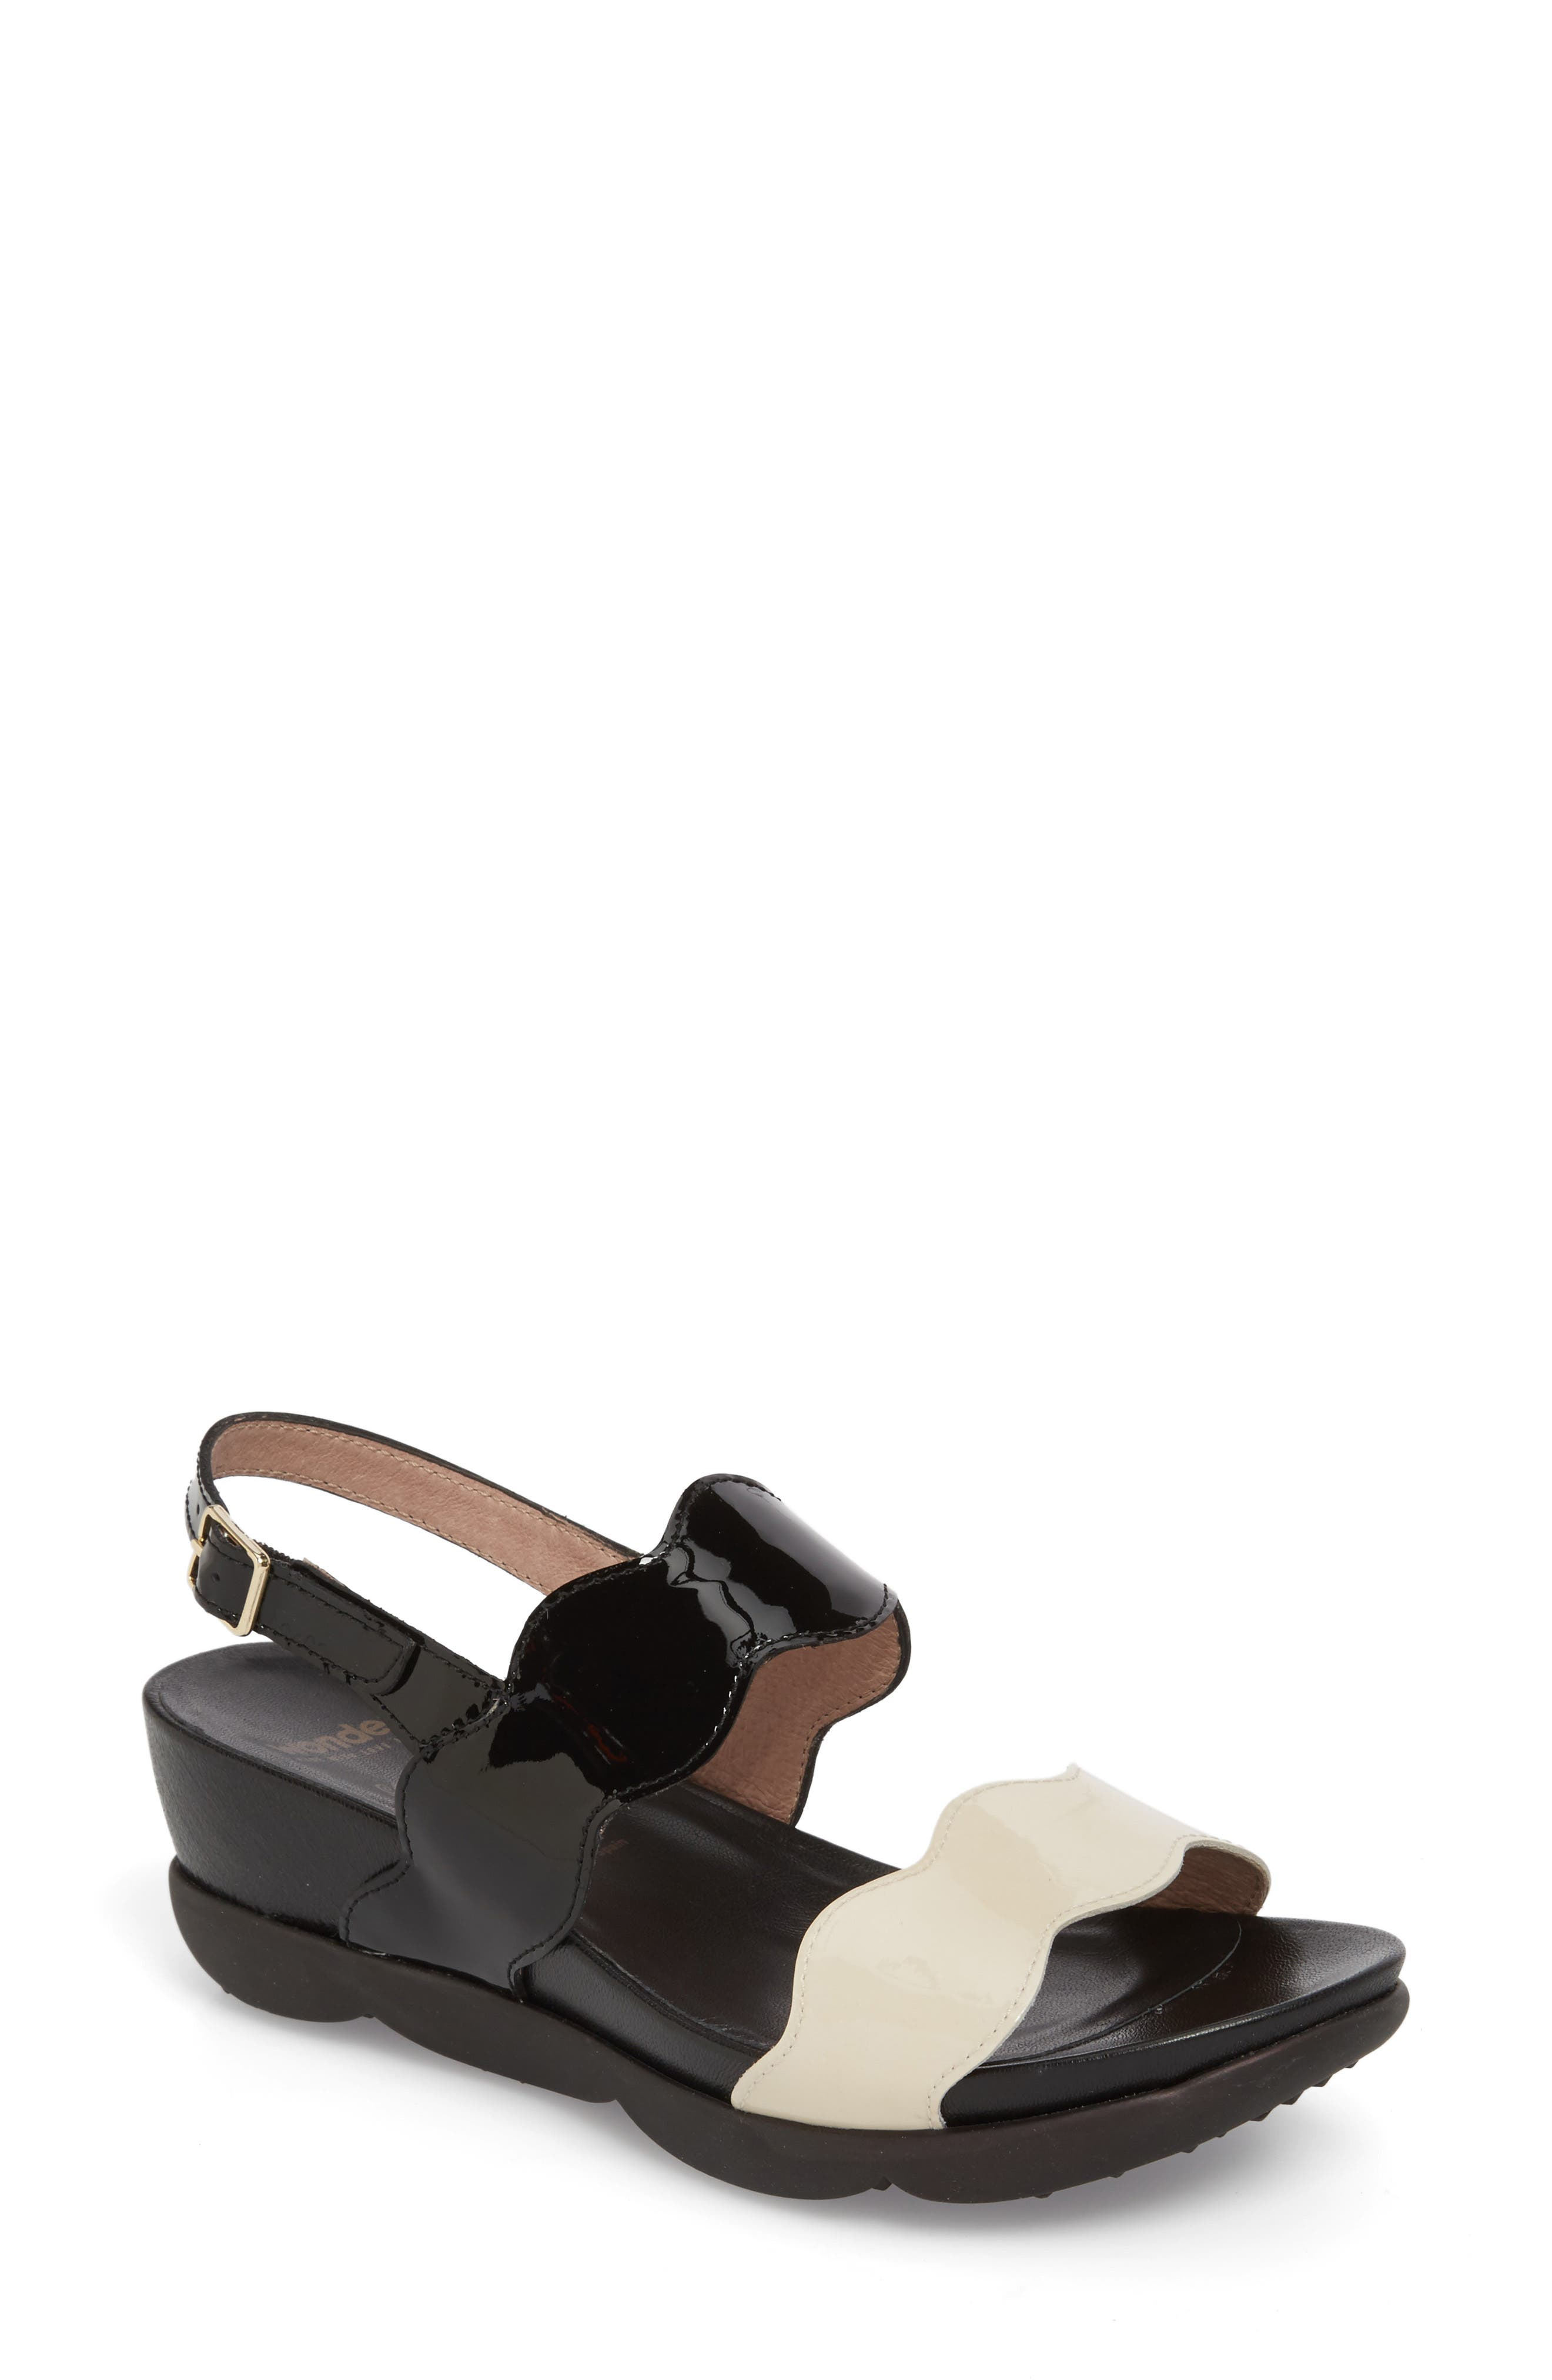 Wedge Sandal,                         Main,                         color, Black/ Off Leather